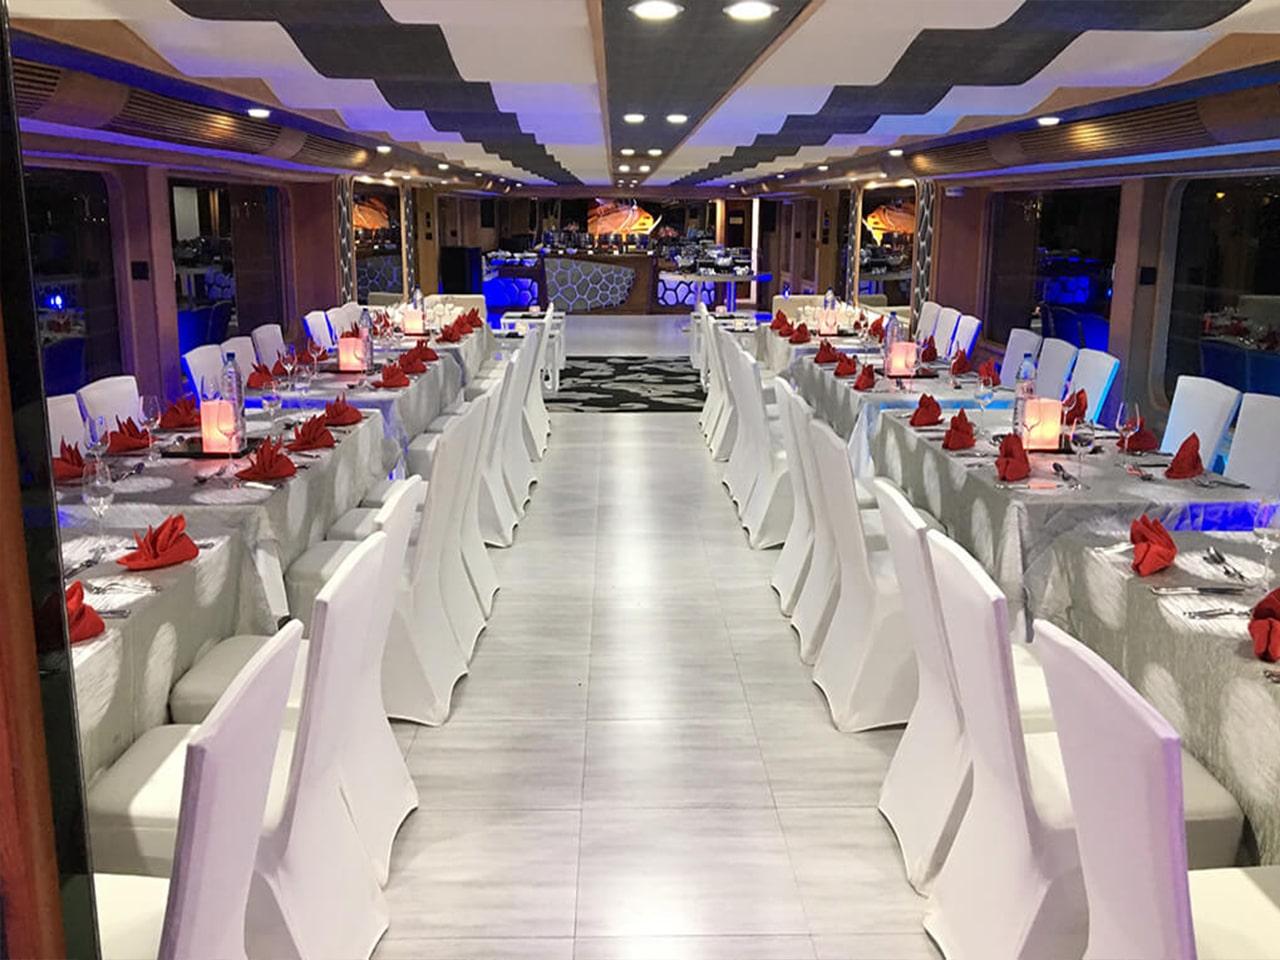 Lotus-Mega-Yacht-Cruise-Dinner-Dubai-Galery-7